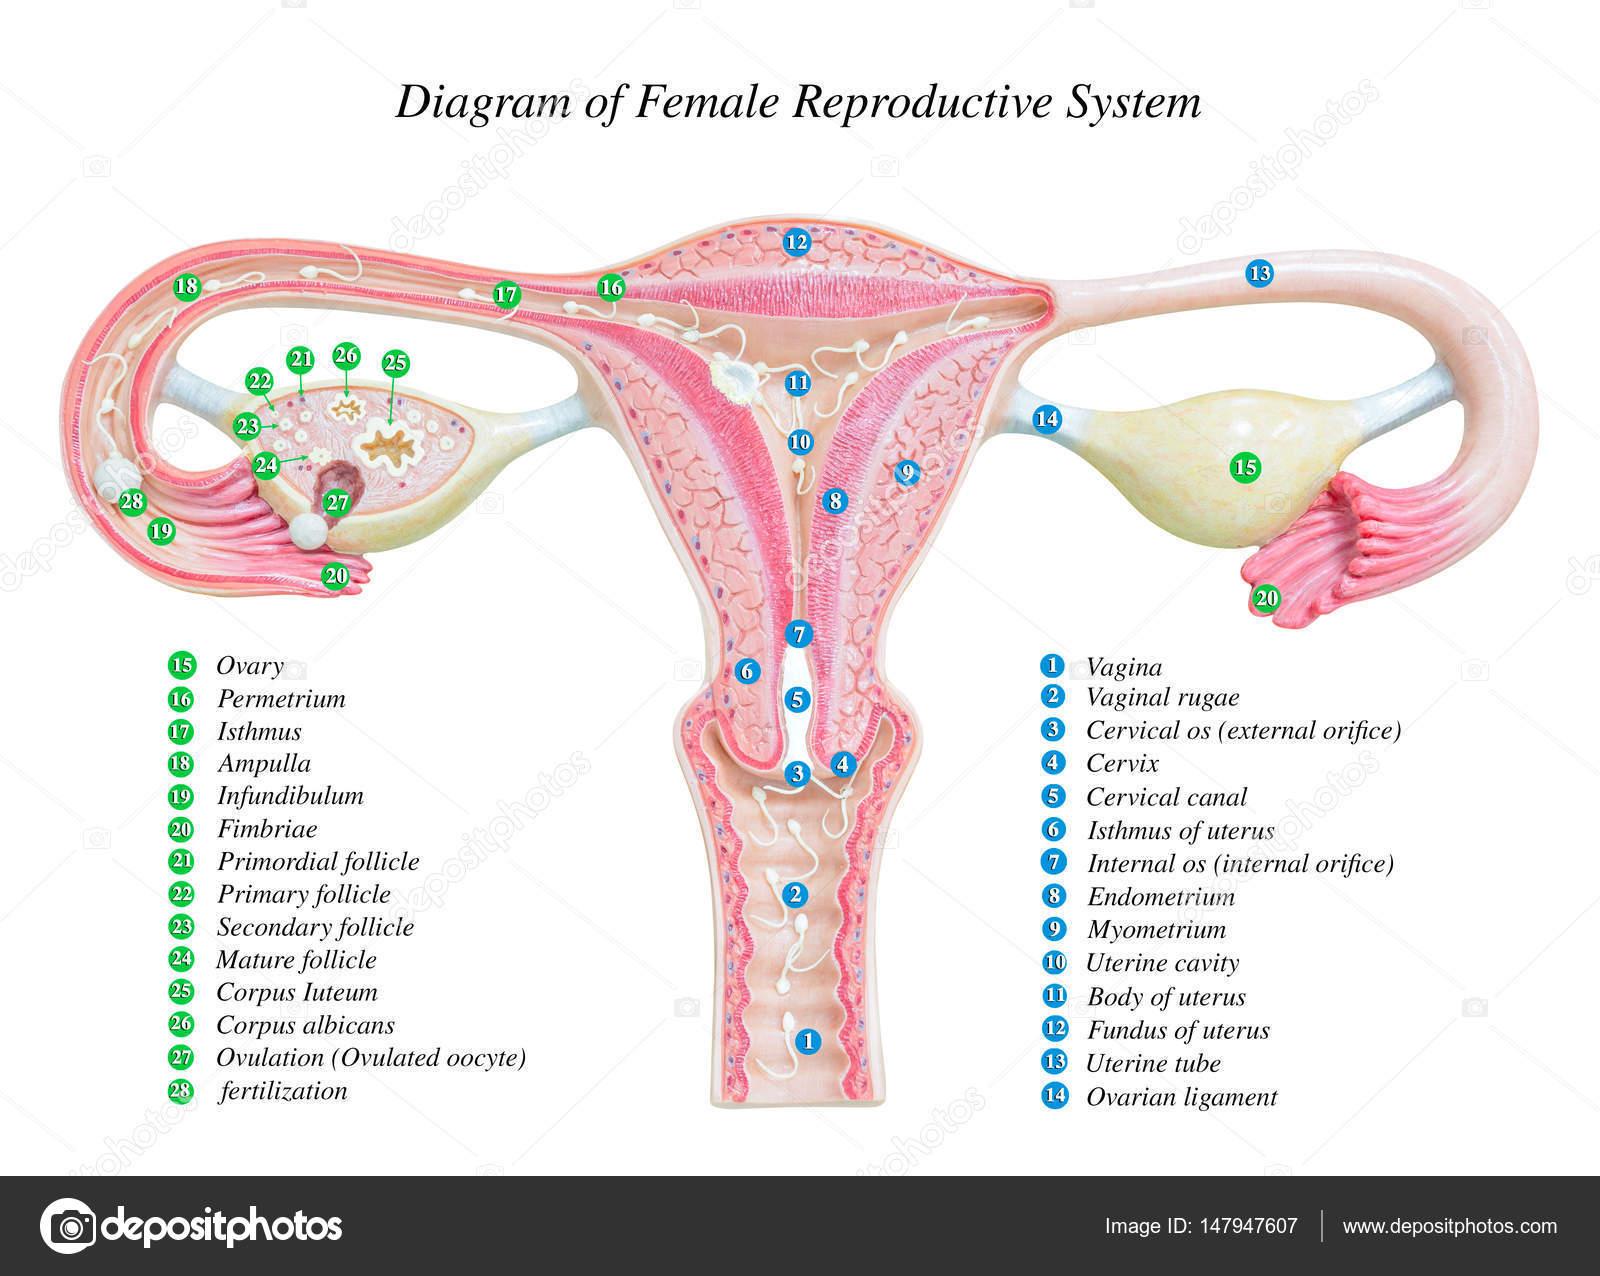 Female Reproductive System Diagram Female Reproductive System Image Diagram Stock Photo Kinwun